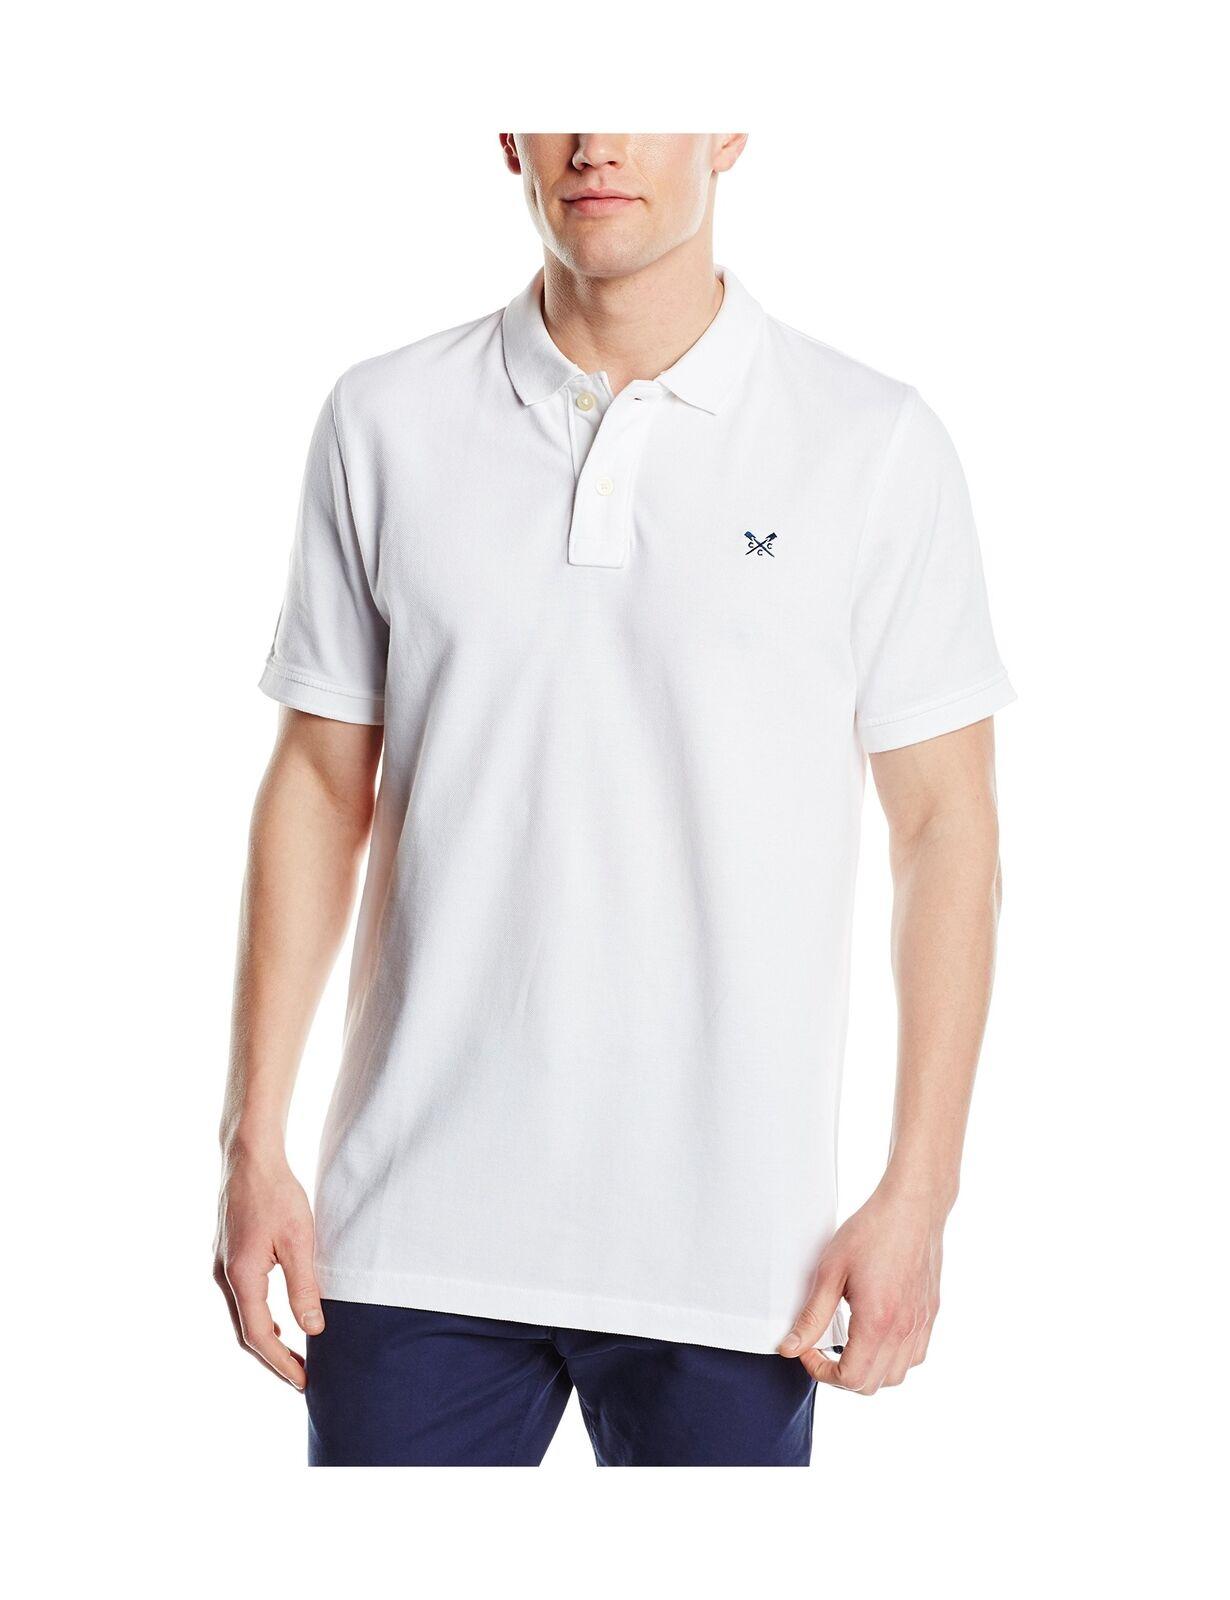 Crew Clothing Men's Classic Pique Polo Shirt White X-Large